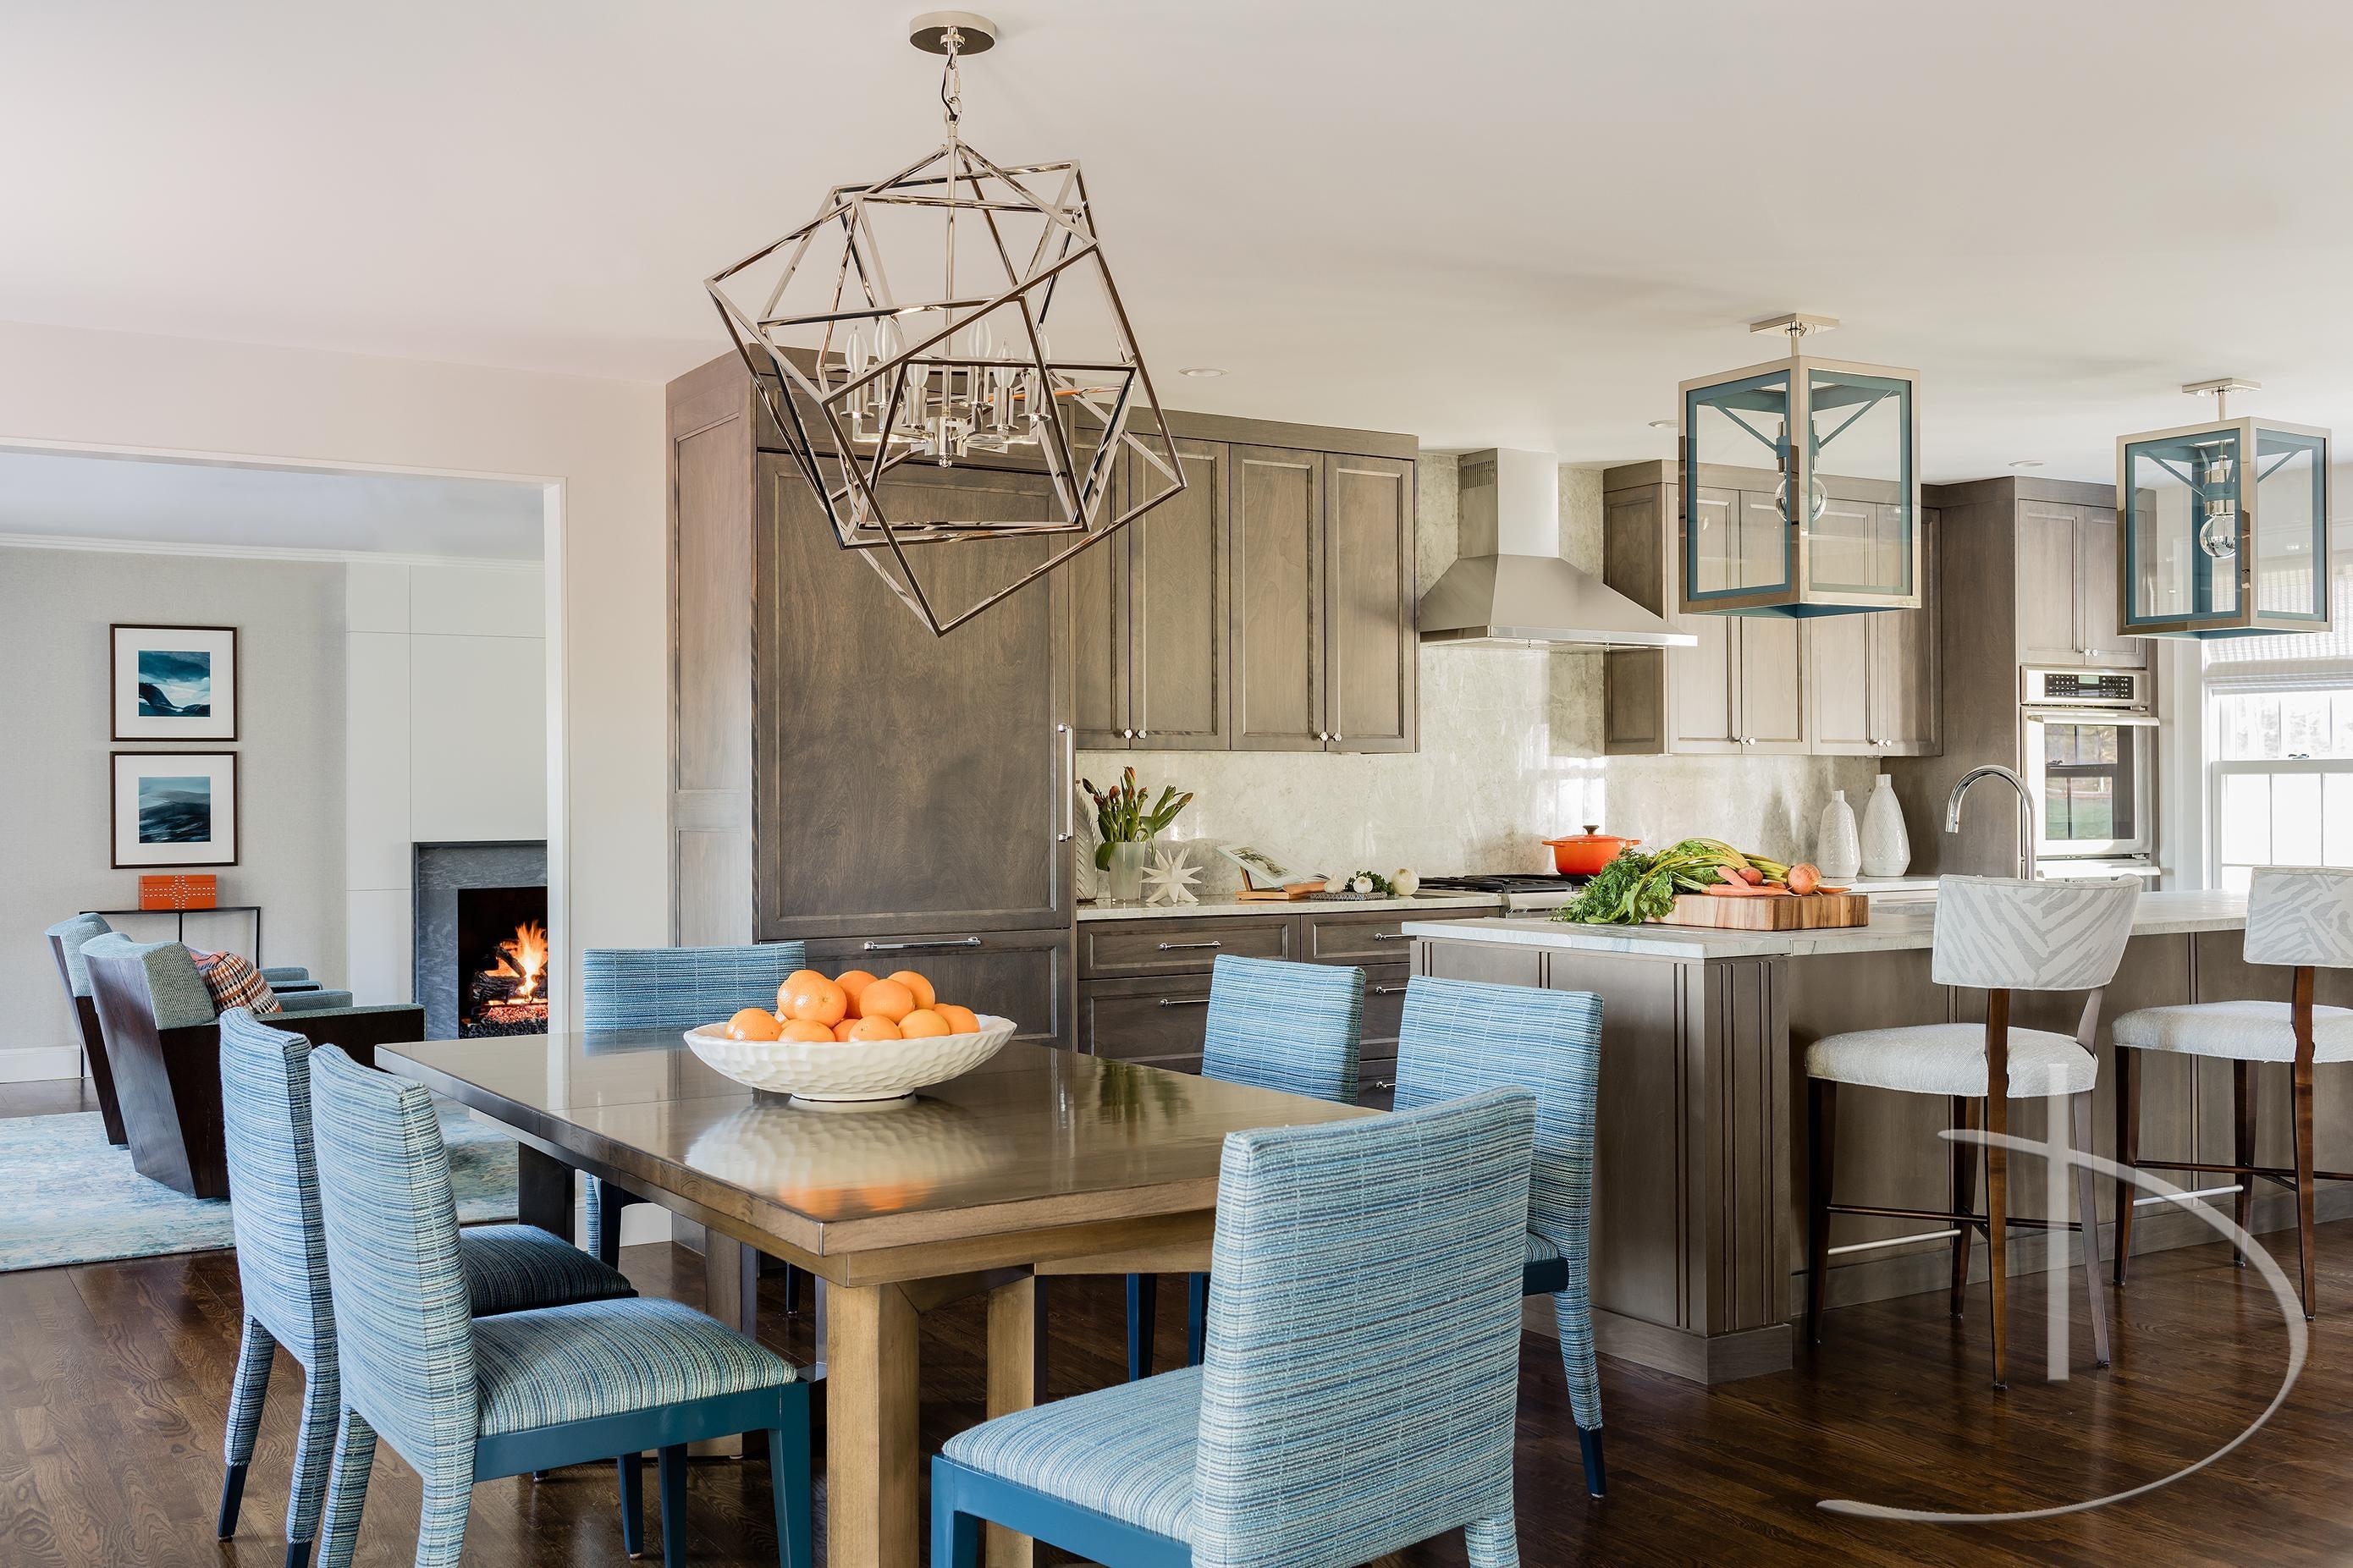 87499.daher.interior.design.portfolio.interiors.kitchen